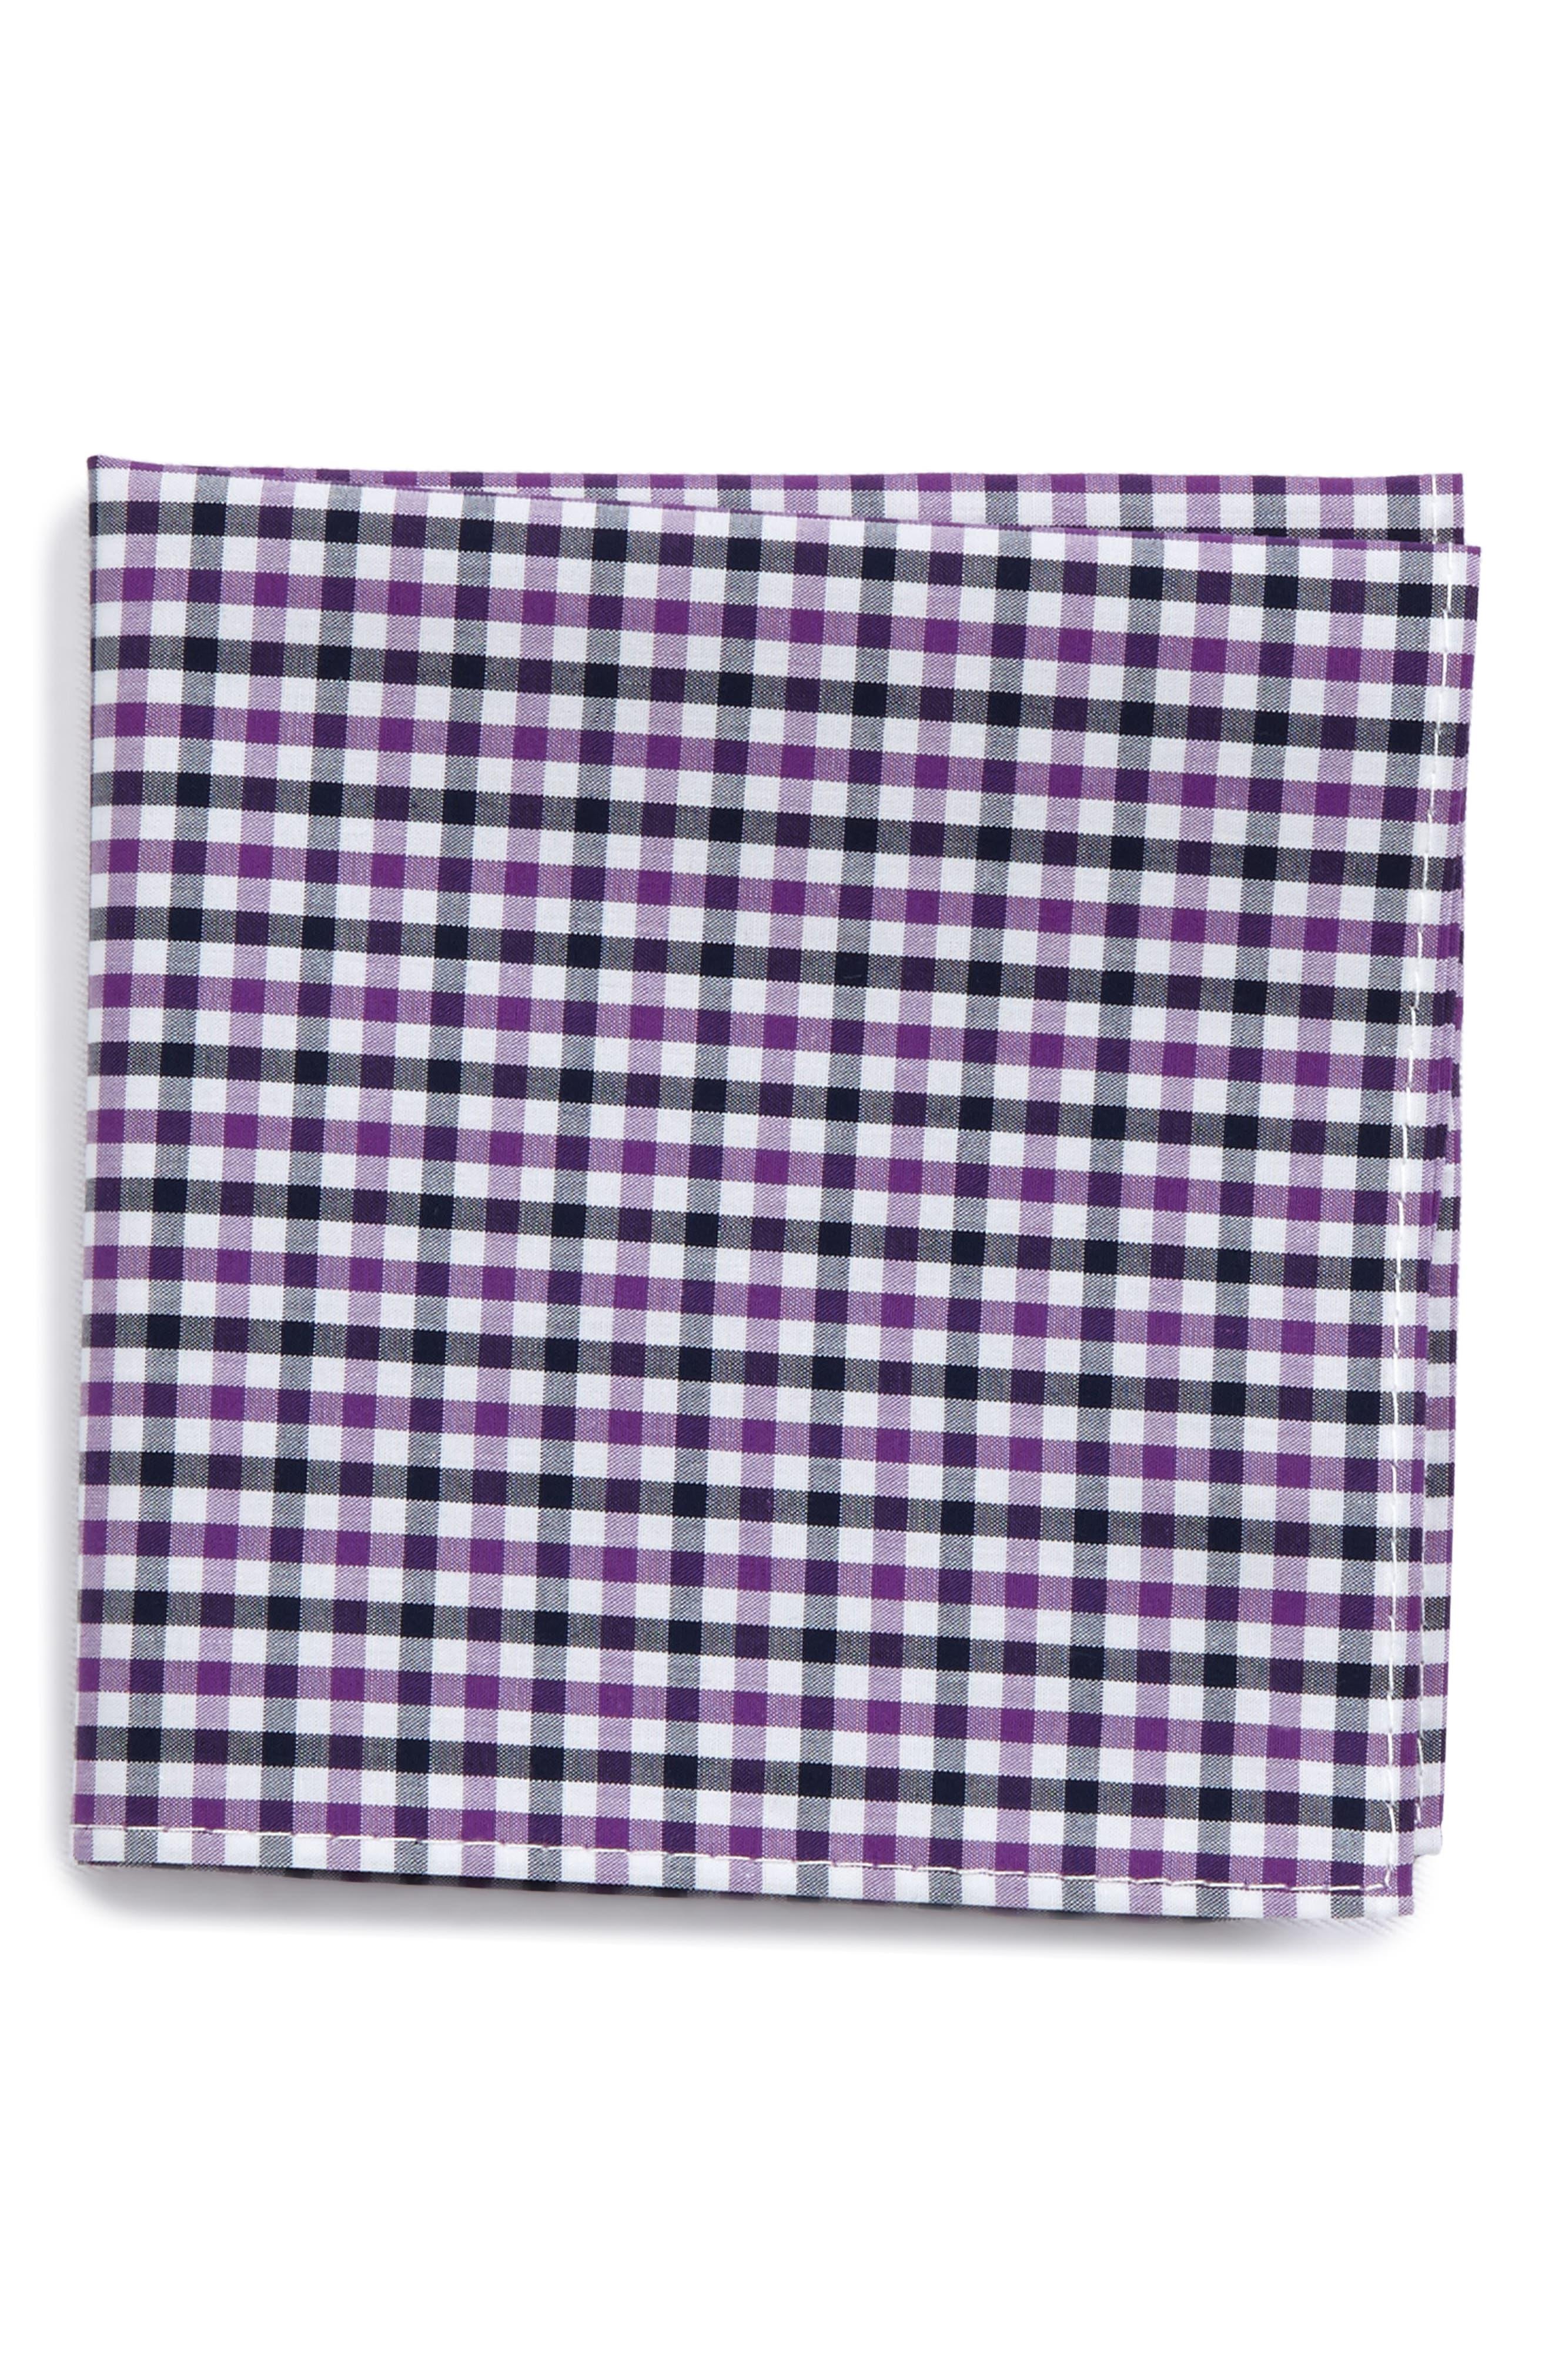 Alternate Image 1 Selected - Nordstrom Check Silk Pocket Square (Big Boys)